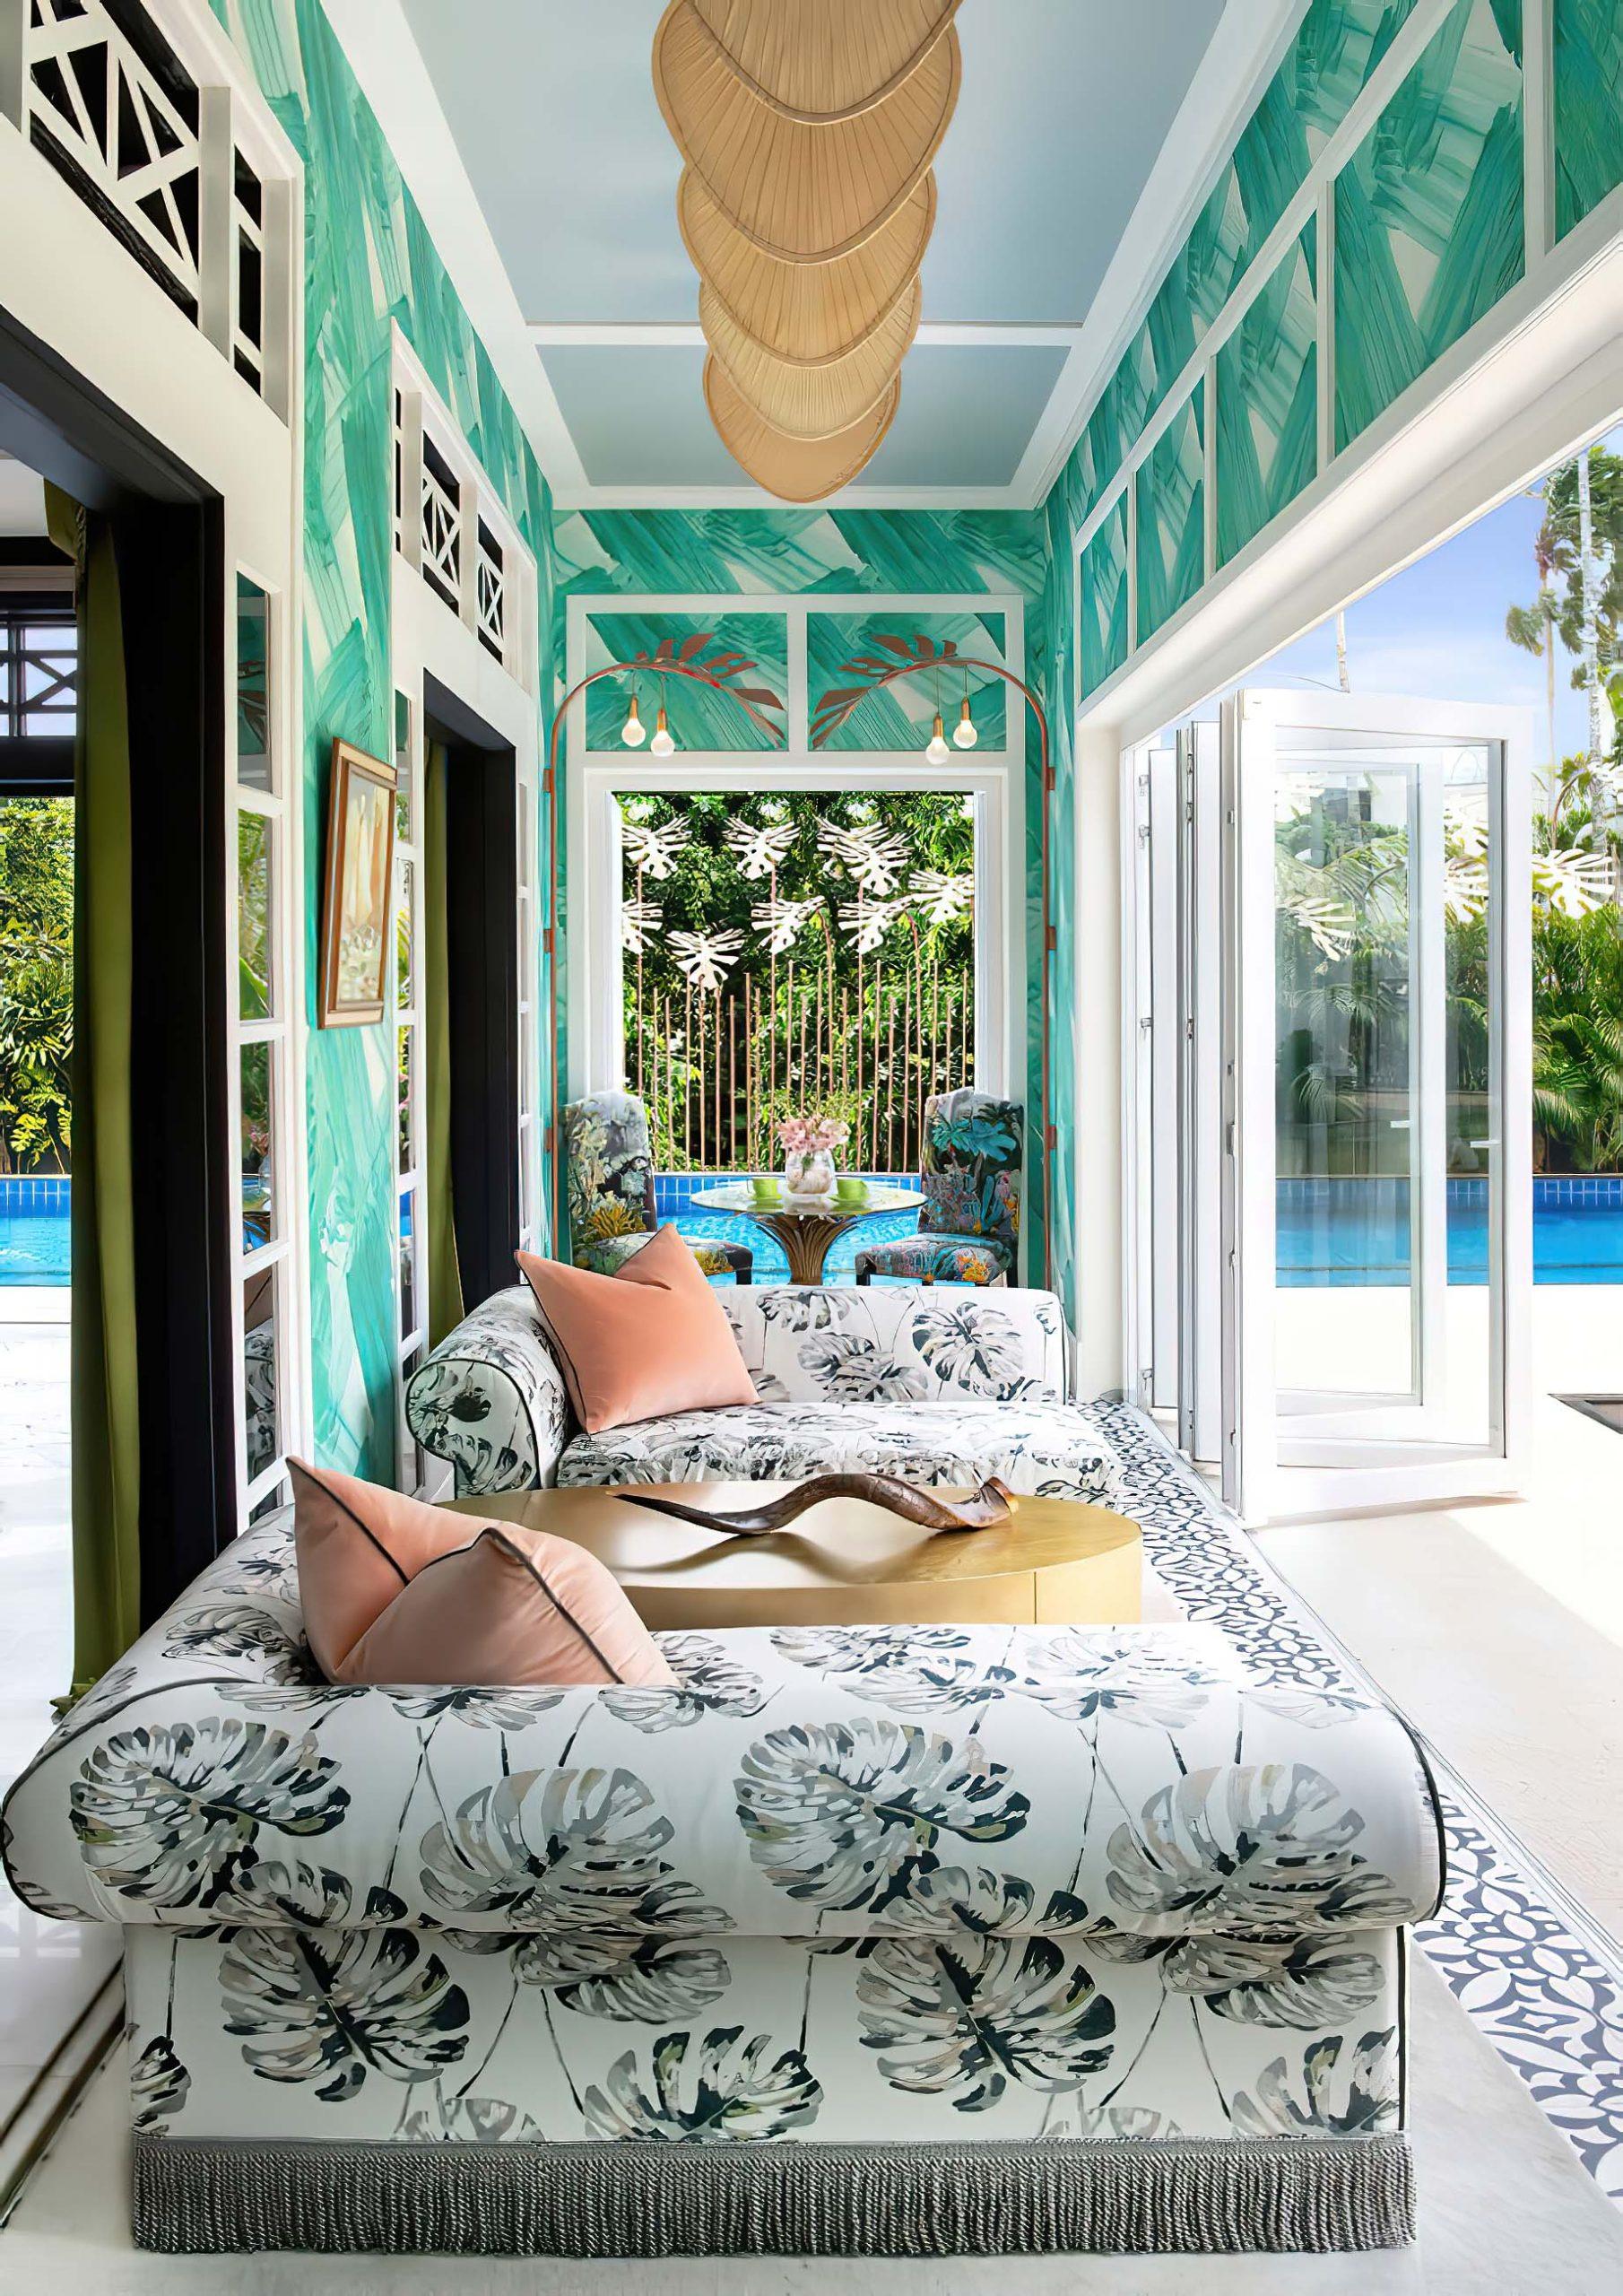 Tropical Maximalist Home Interior Singapore – Design Intervention